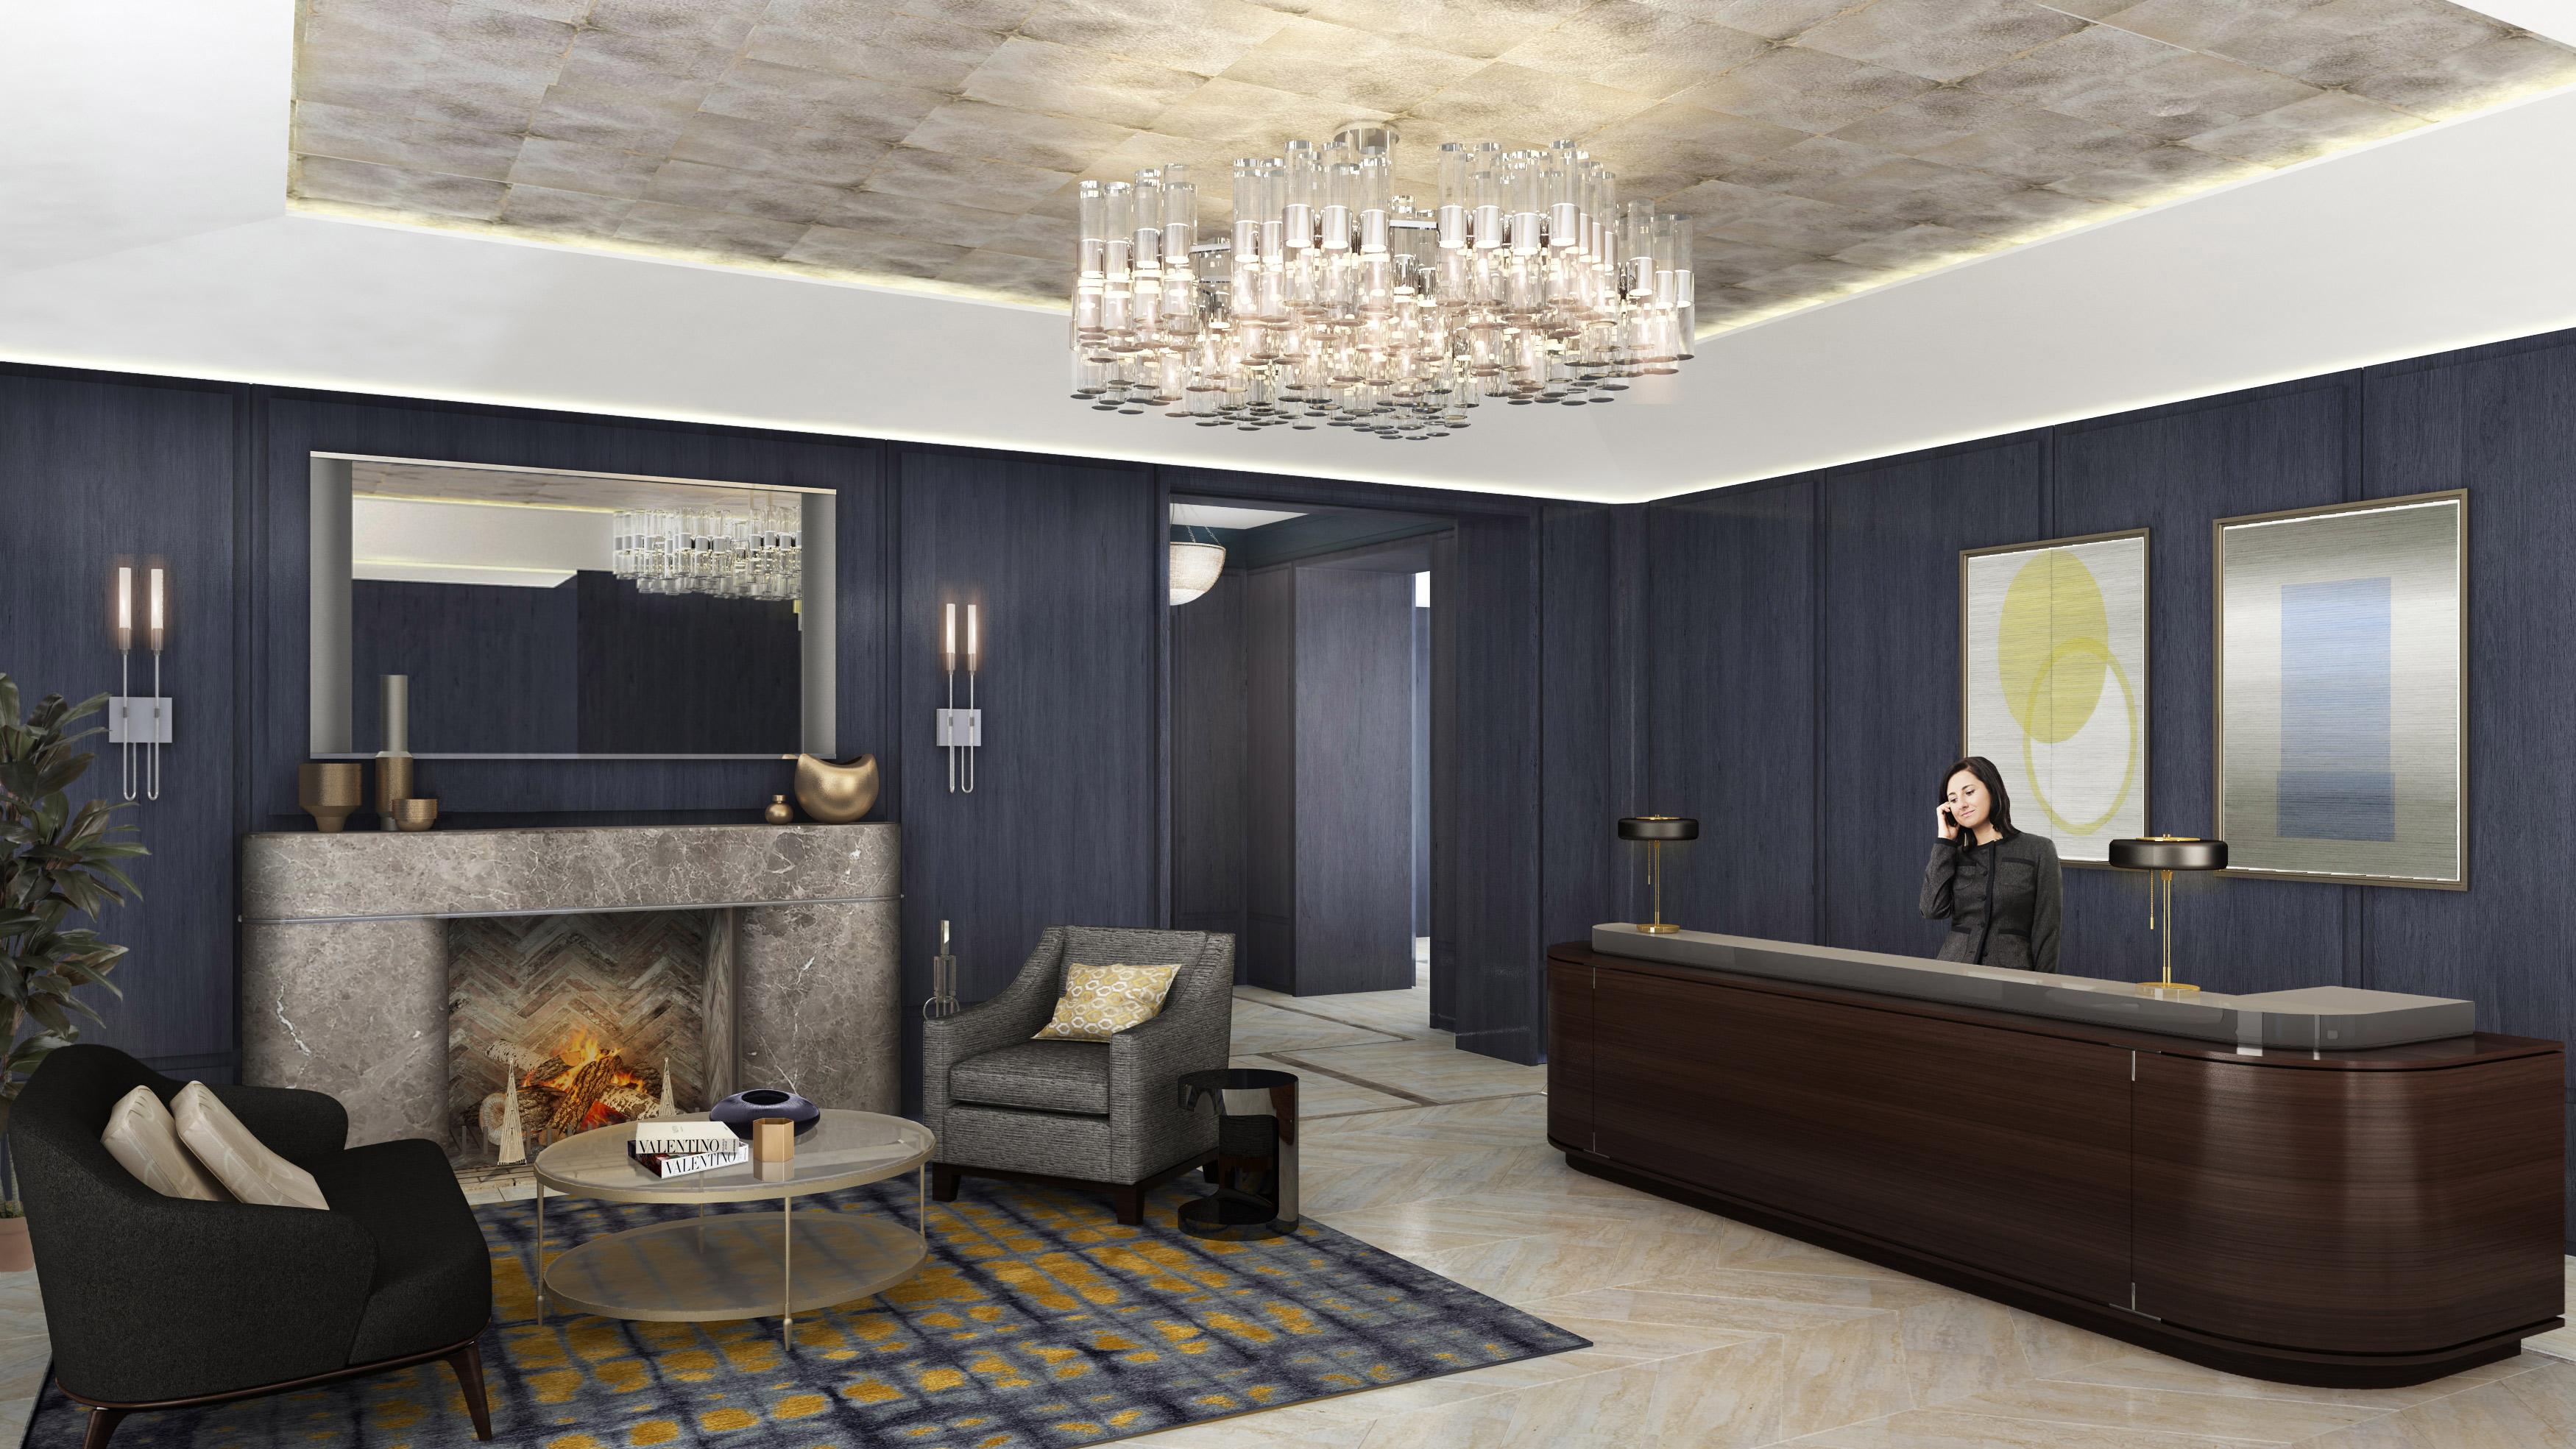 Captivating Chicago Gold Coast 33 Unit Building Luxury Design By   Soucie Horner, Ltd.